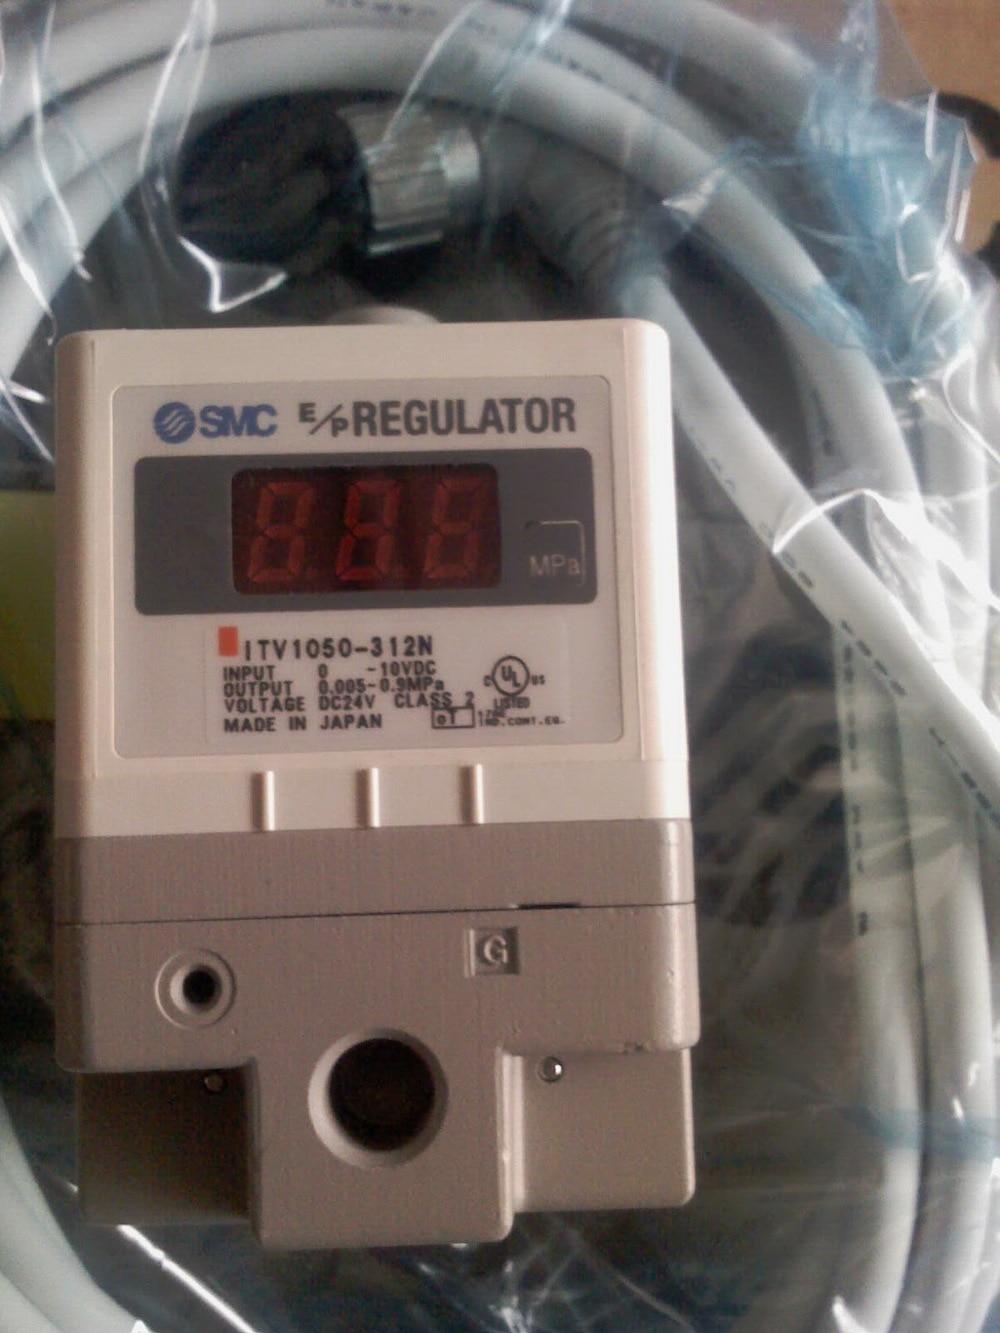 ELECTRO/PNEUMATIC REGULATOR ITV1010-312CS 24VDC 1/8 PORT NEW itv2030 312l electro pneumatic regulator 24vdc 1 4 port 0 10v input